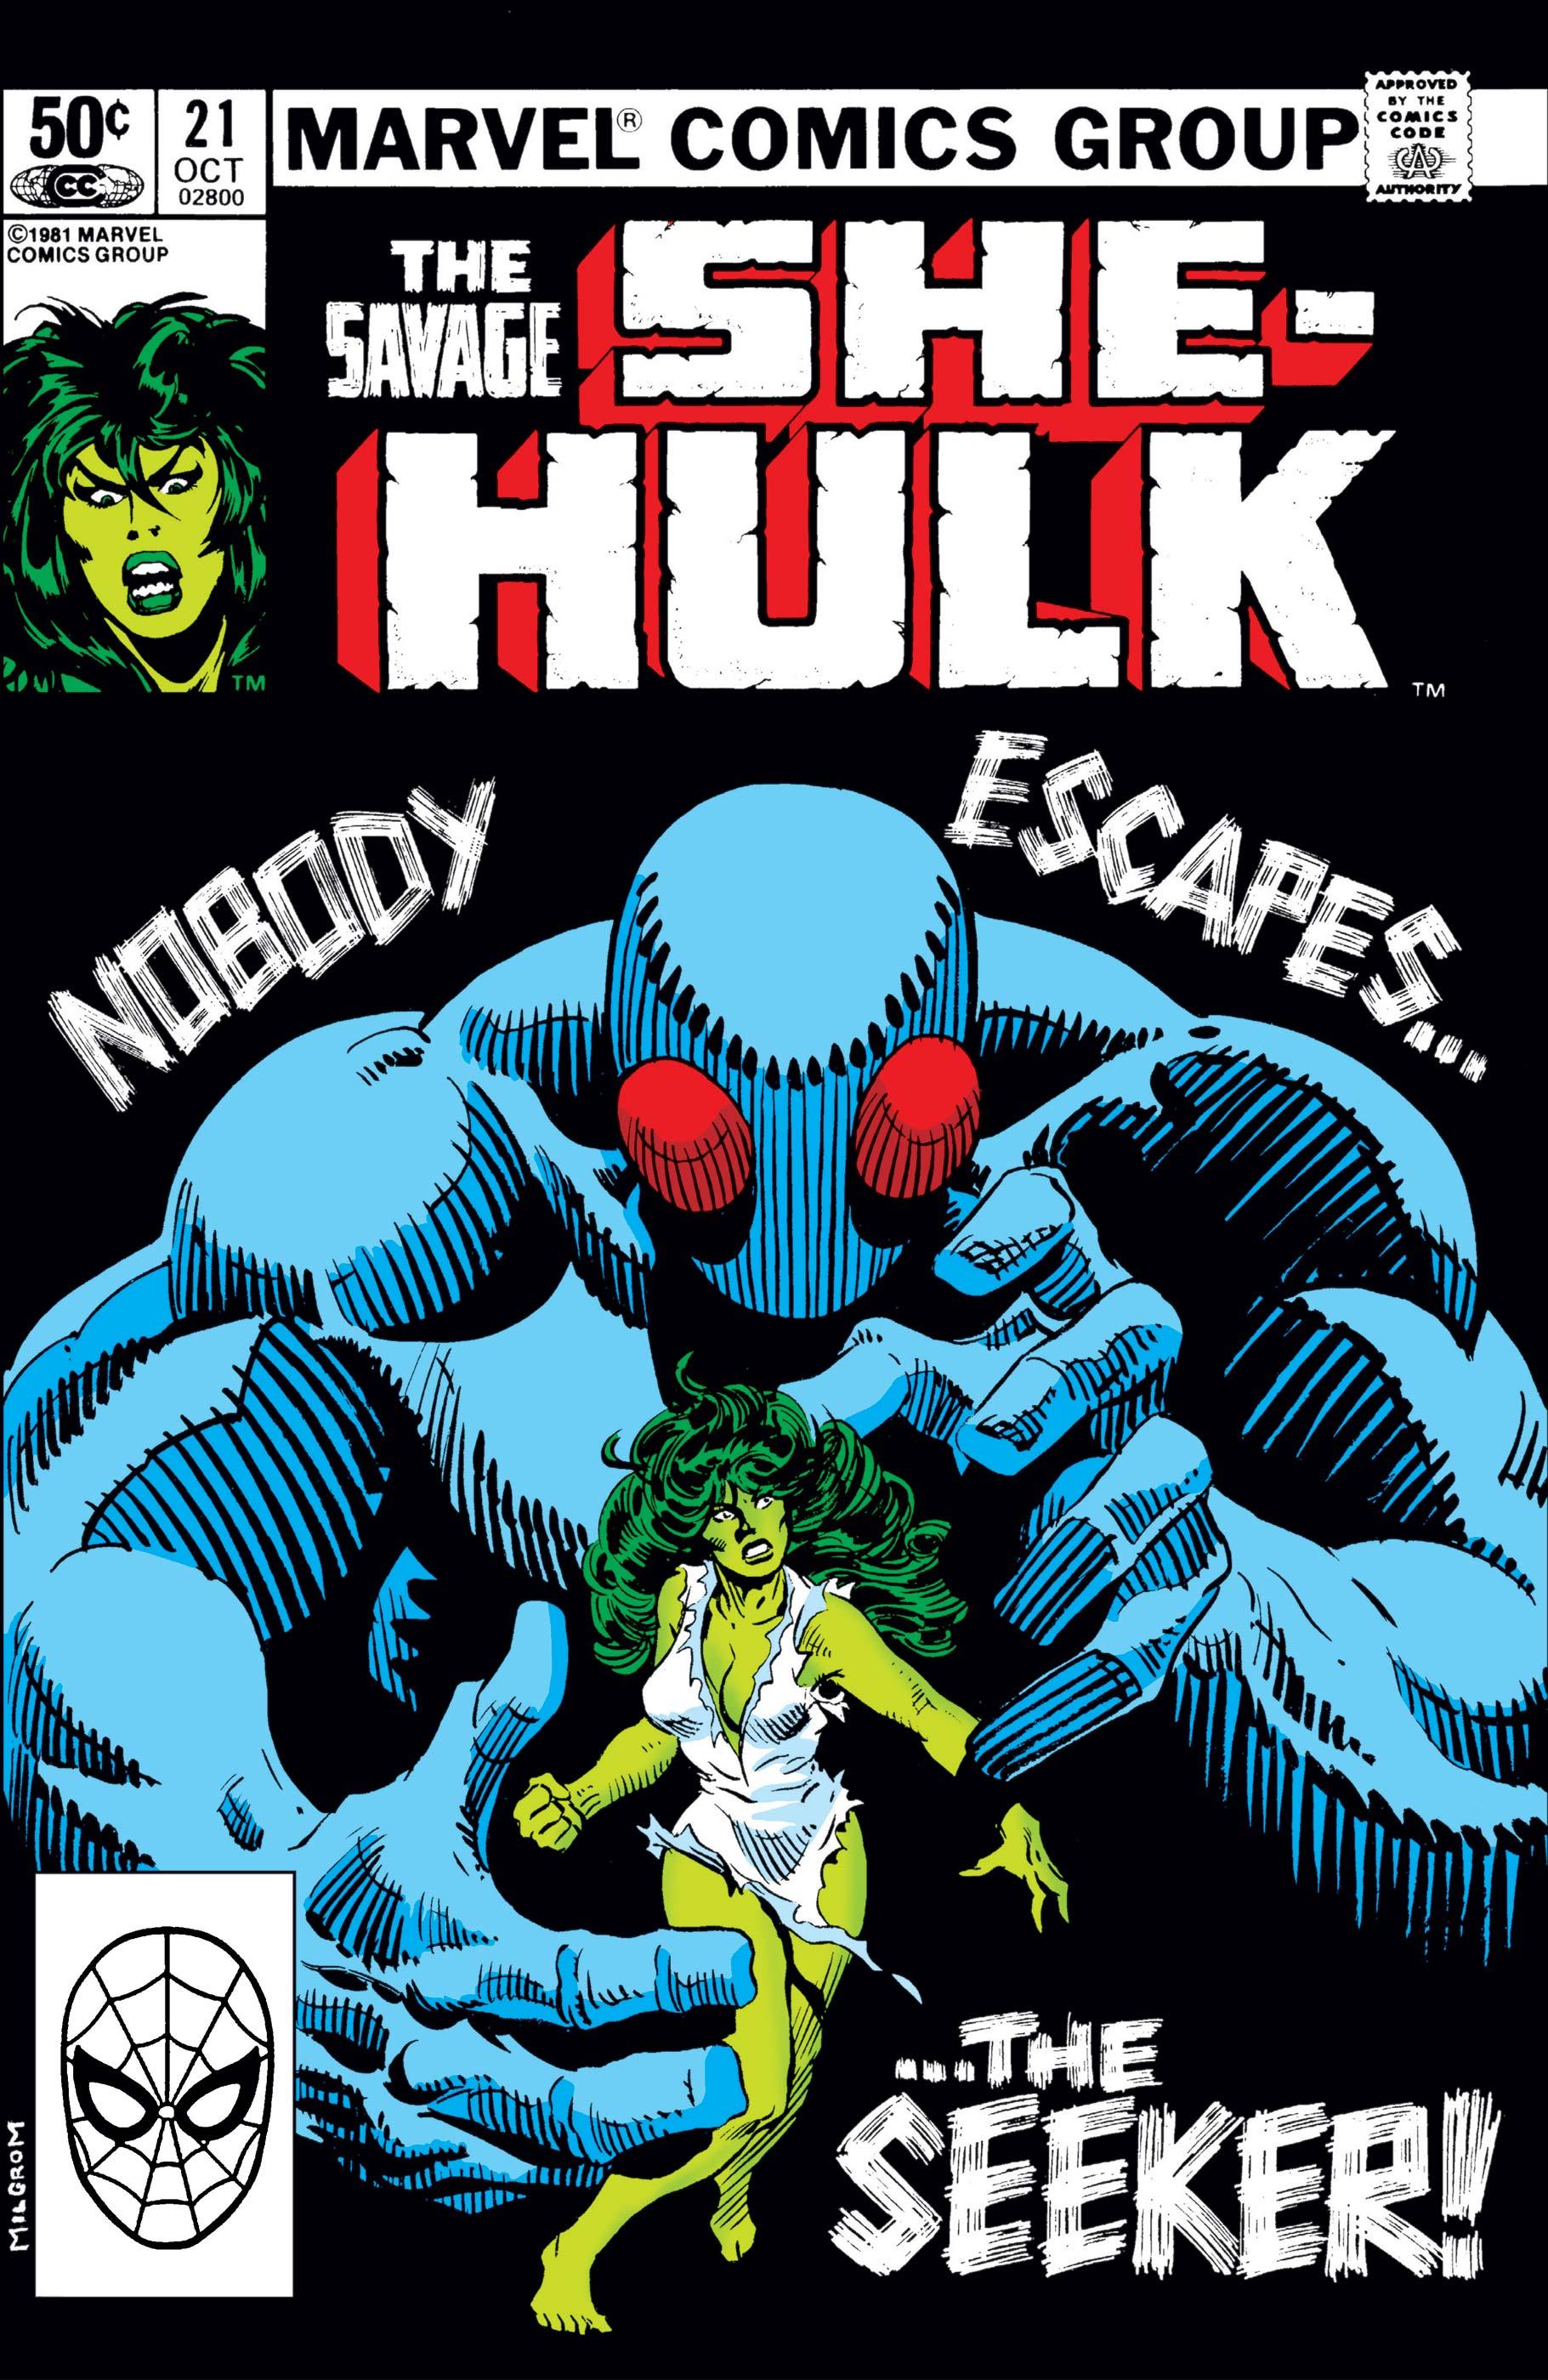 Savage She-Hulk (1980) #21